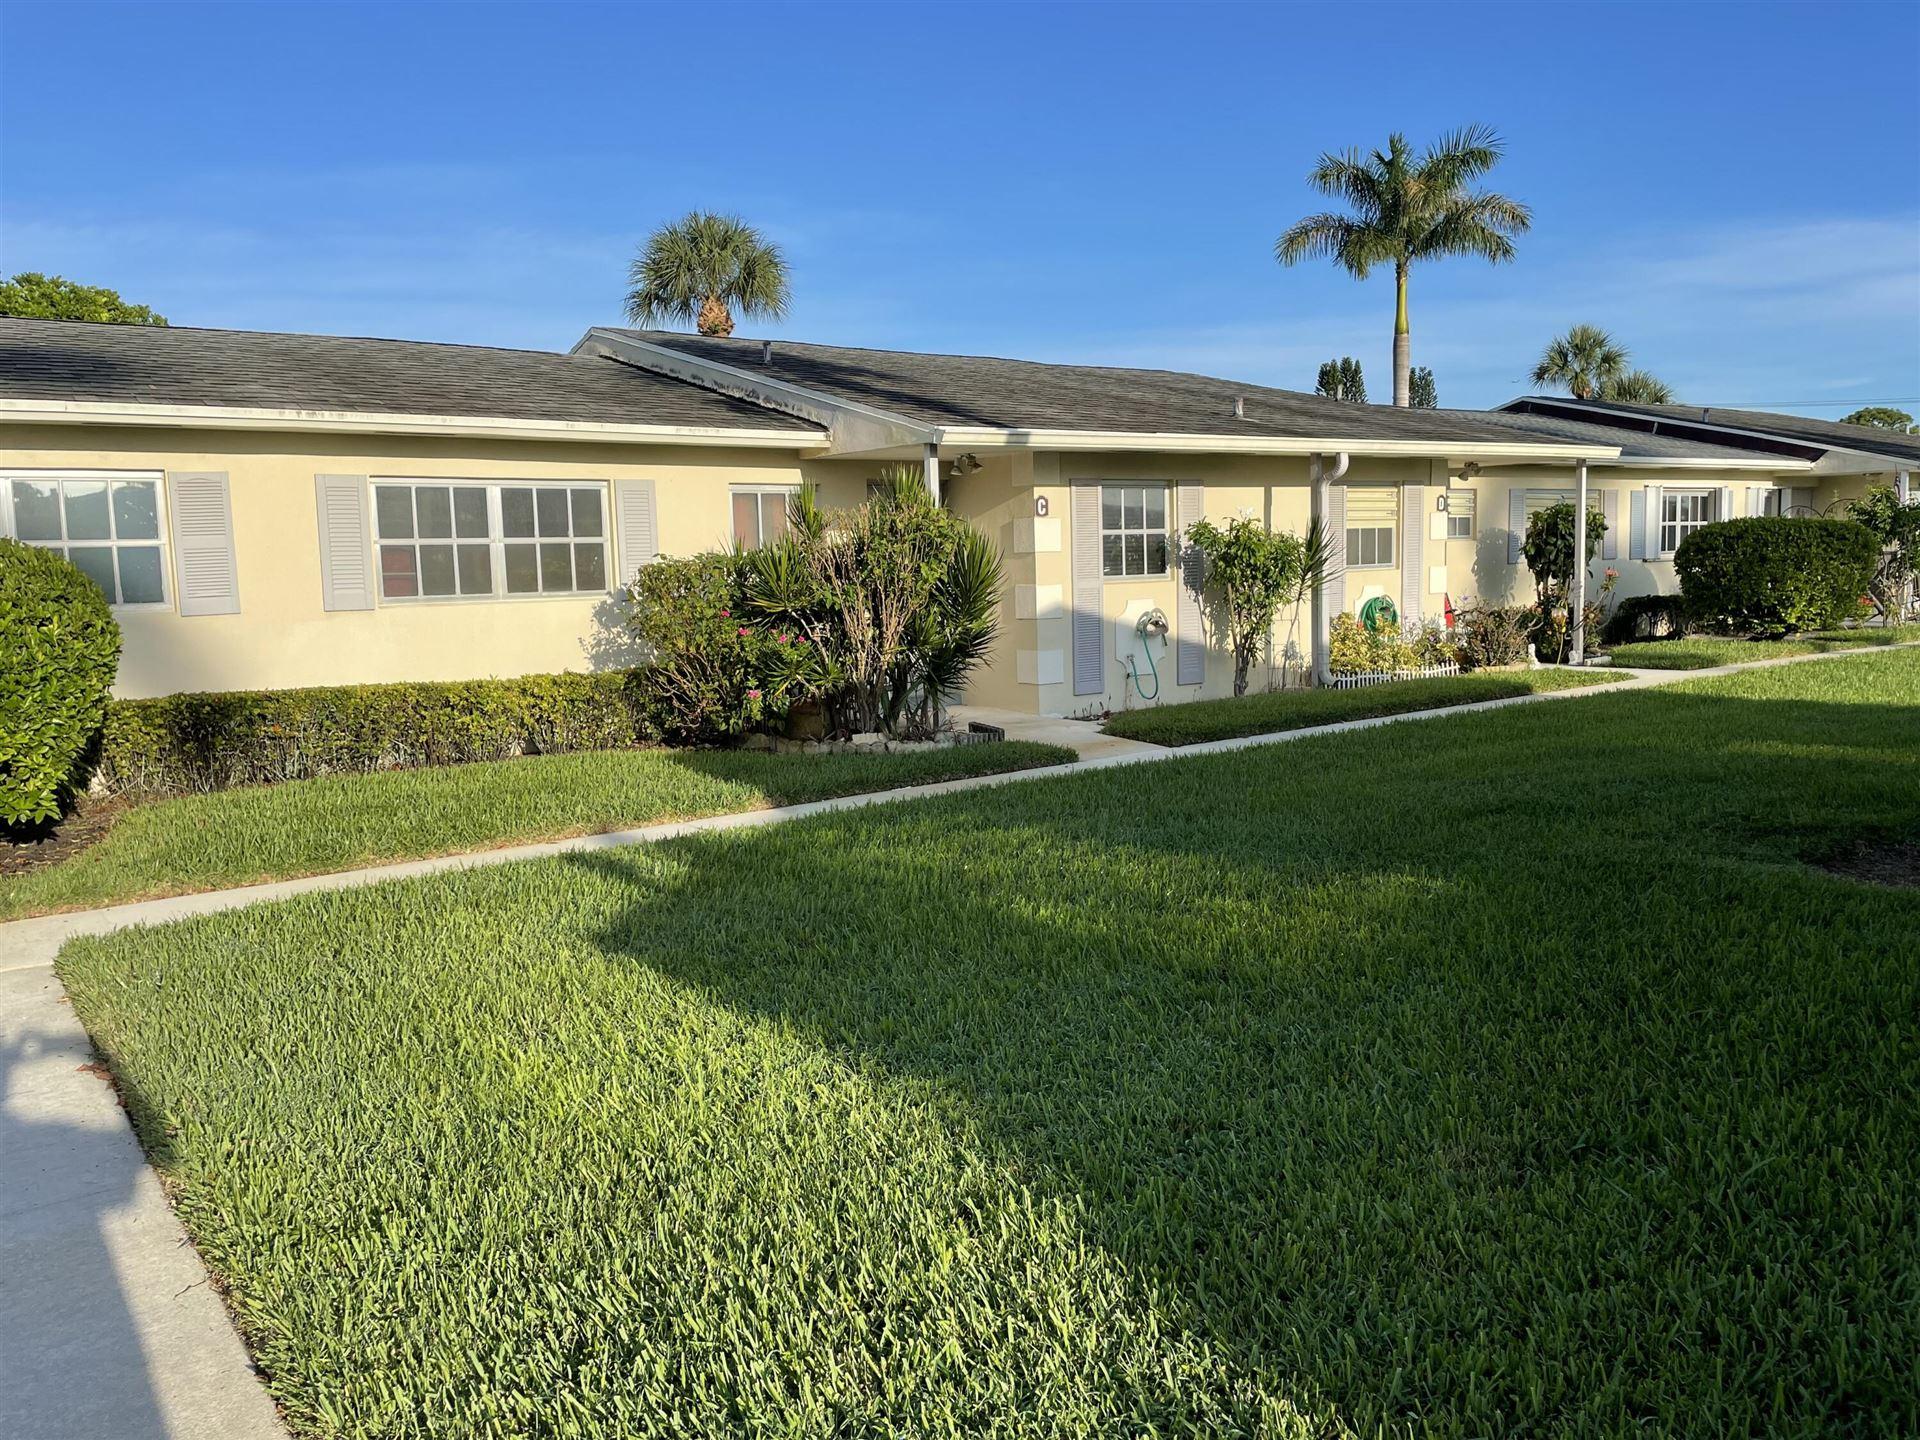 2781 Ashley Drive E #C, West Palm Beach, FL 33415 - #: RX-10747644